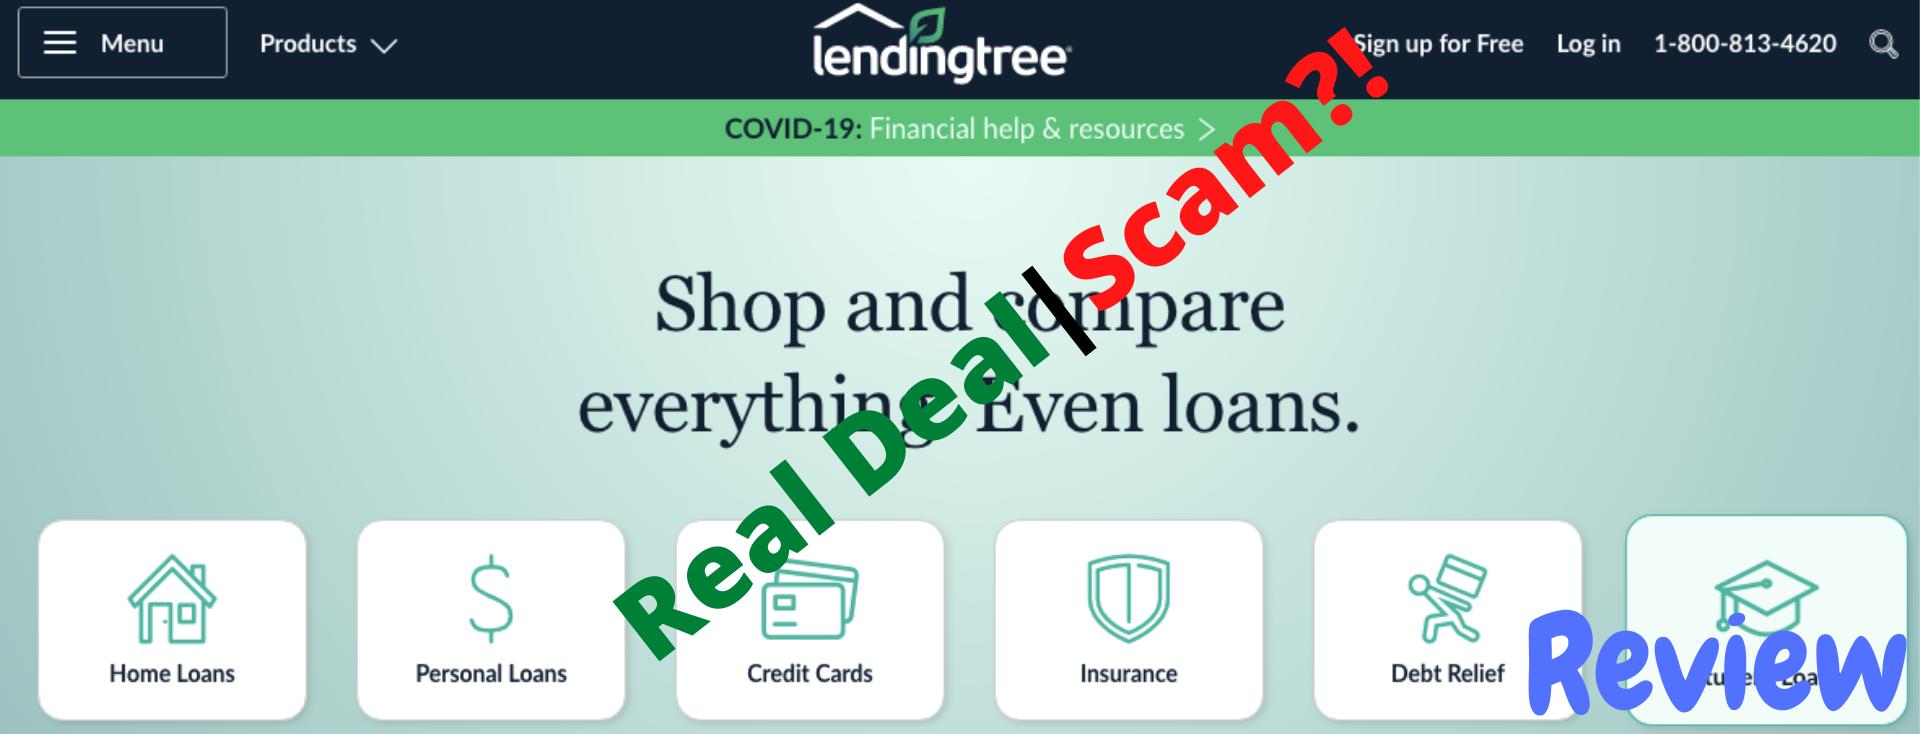 LendingTree real deal or scam?!